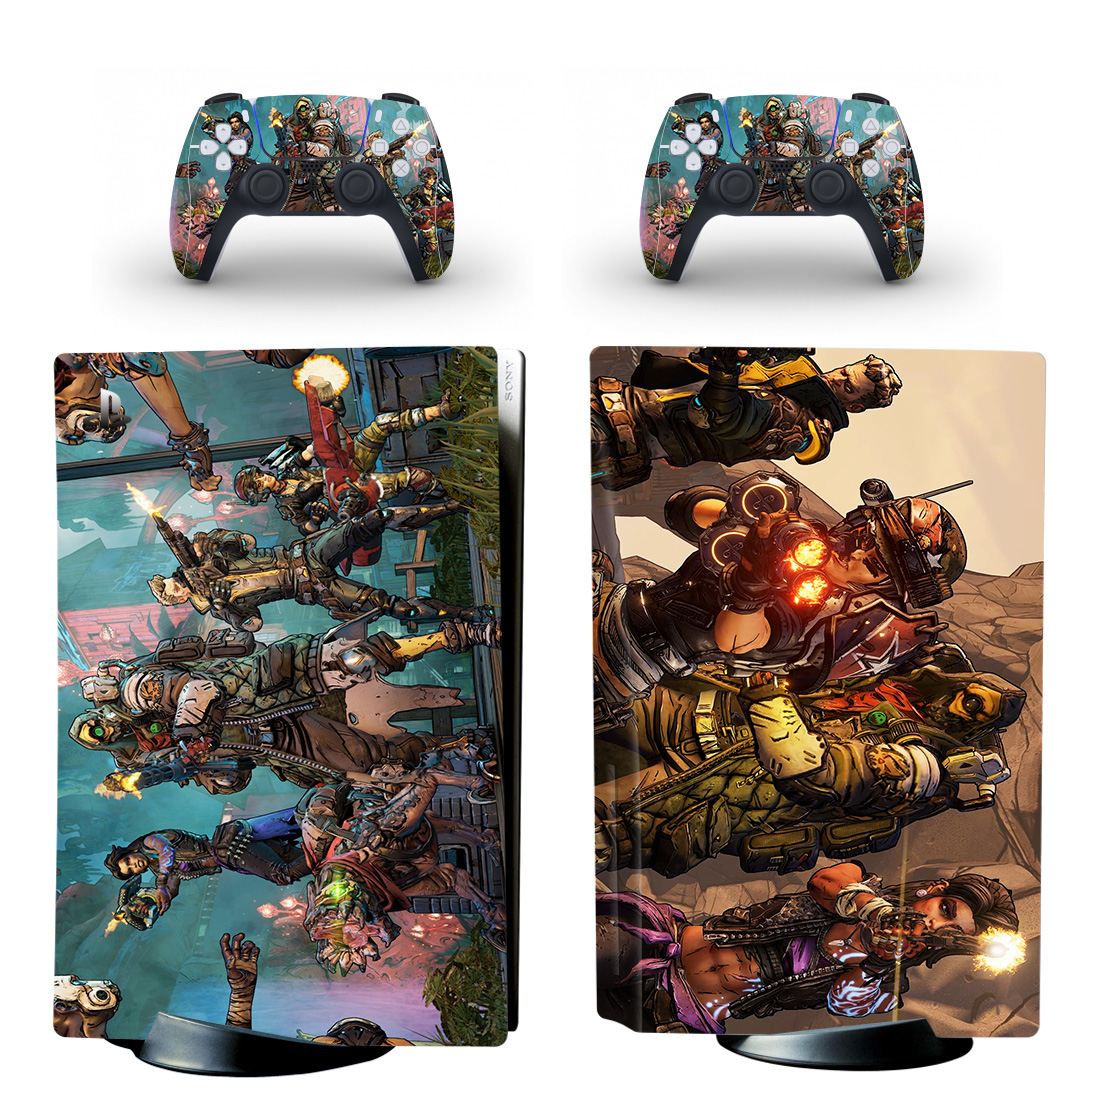 Borderlands 3 PS5 Skin Sticker Decal Design 1